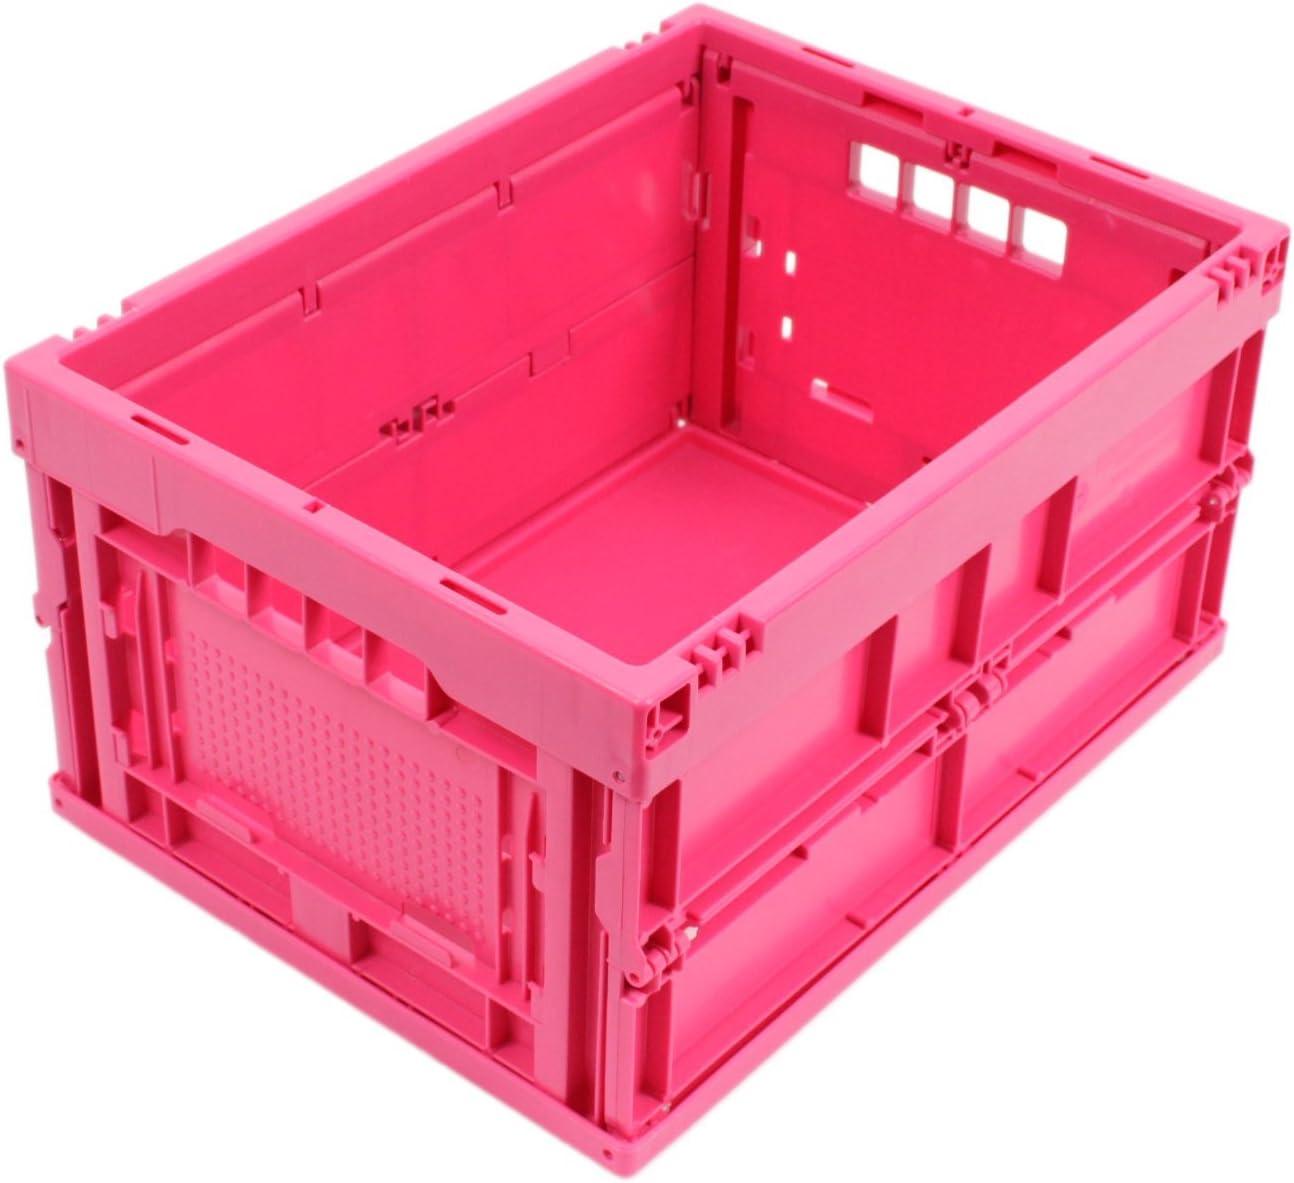 CAJA PLEGABLE 20L, caja plegable de plastico, pequeña caja de transporte, cesta de la compra, 40x30x22 cm, rosa: Amazon.es: Bricolaje y herramientas